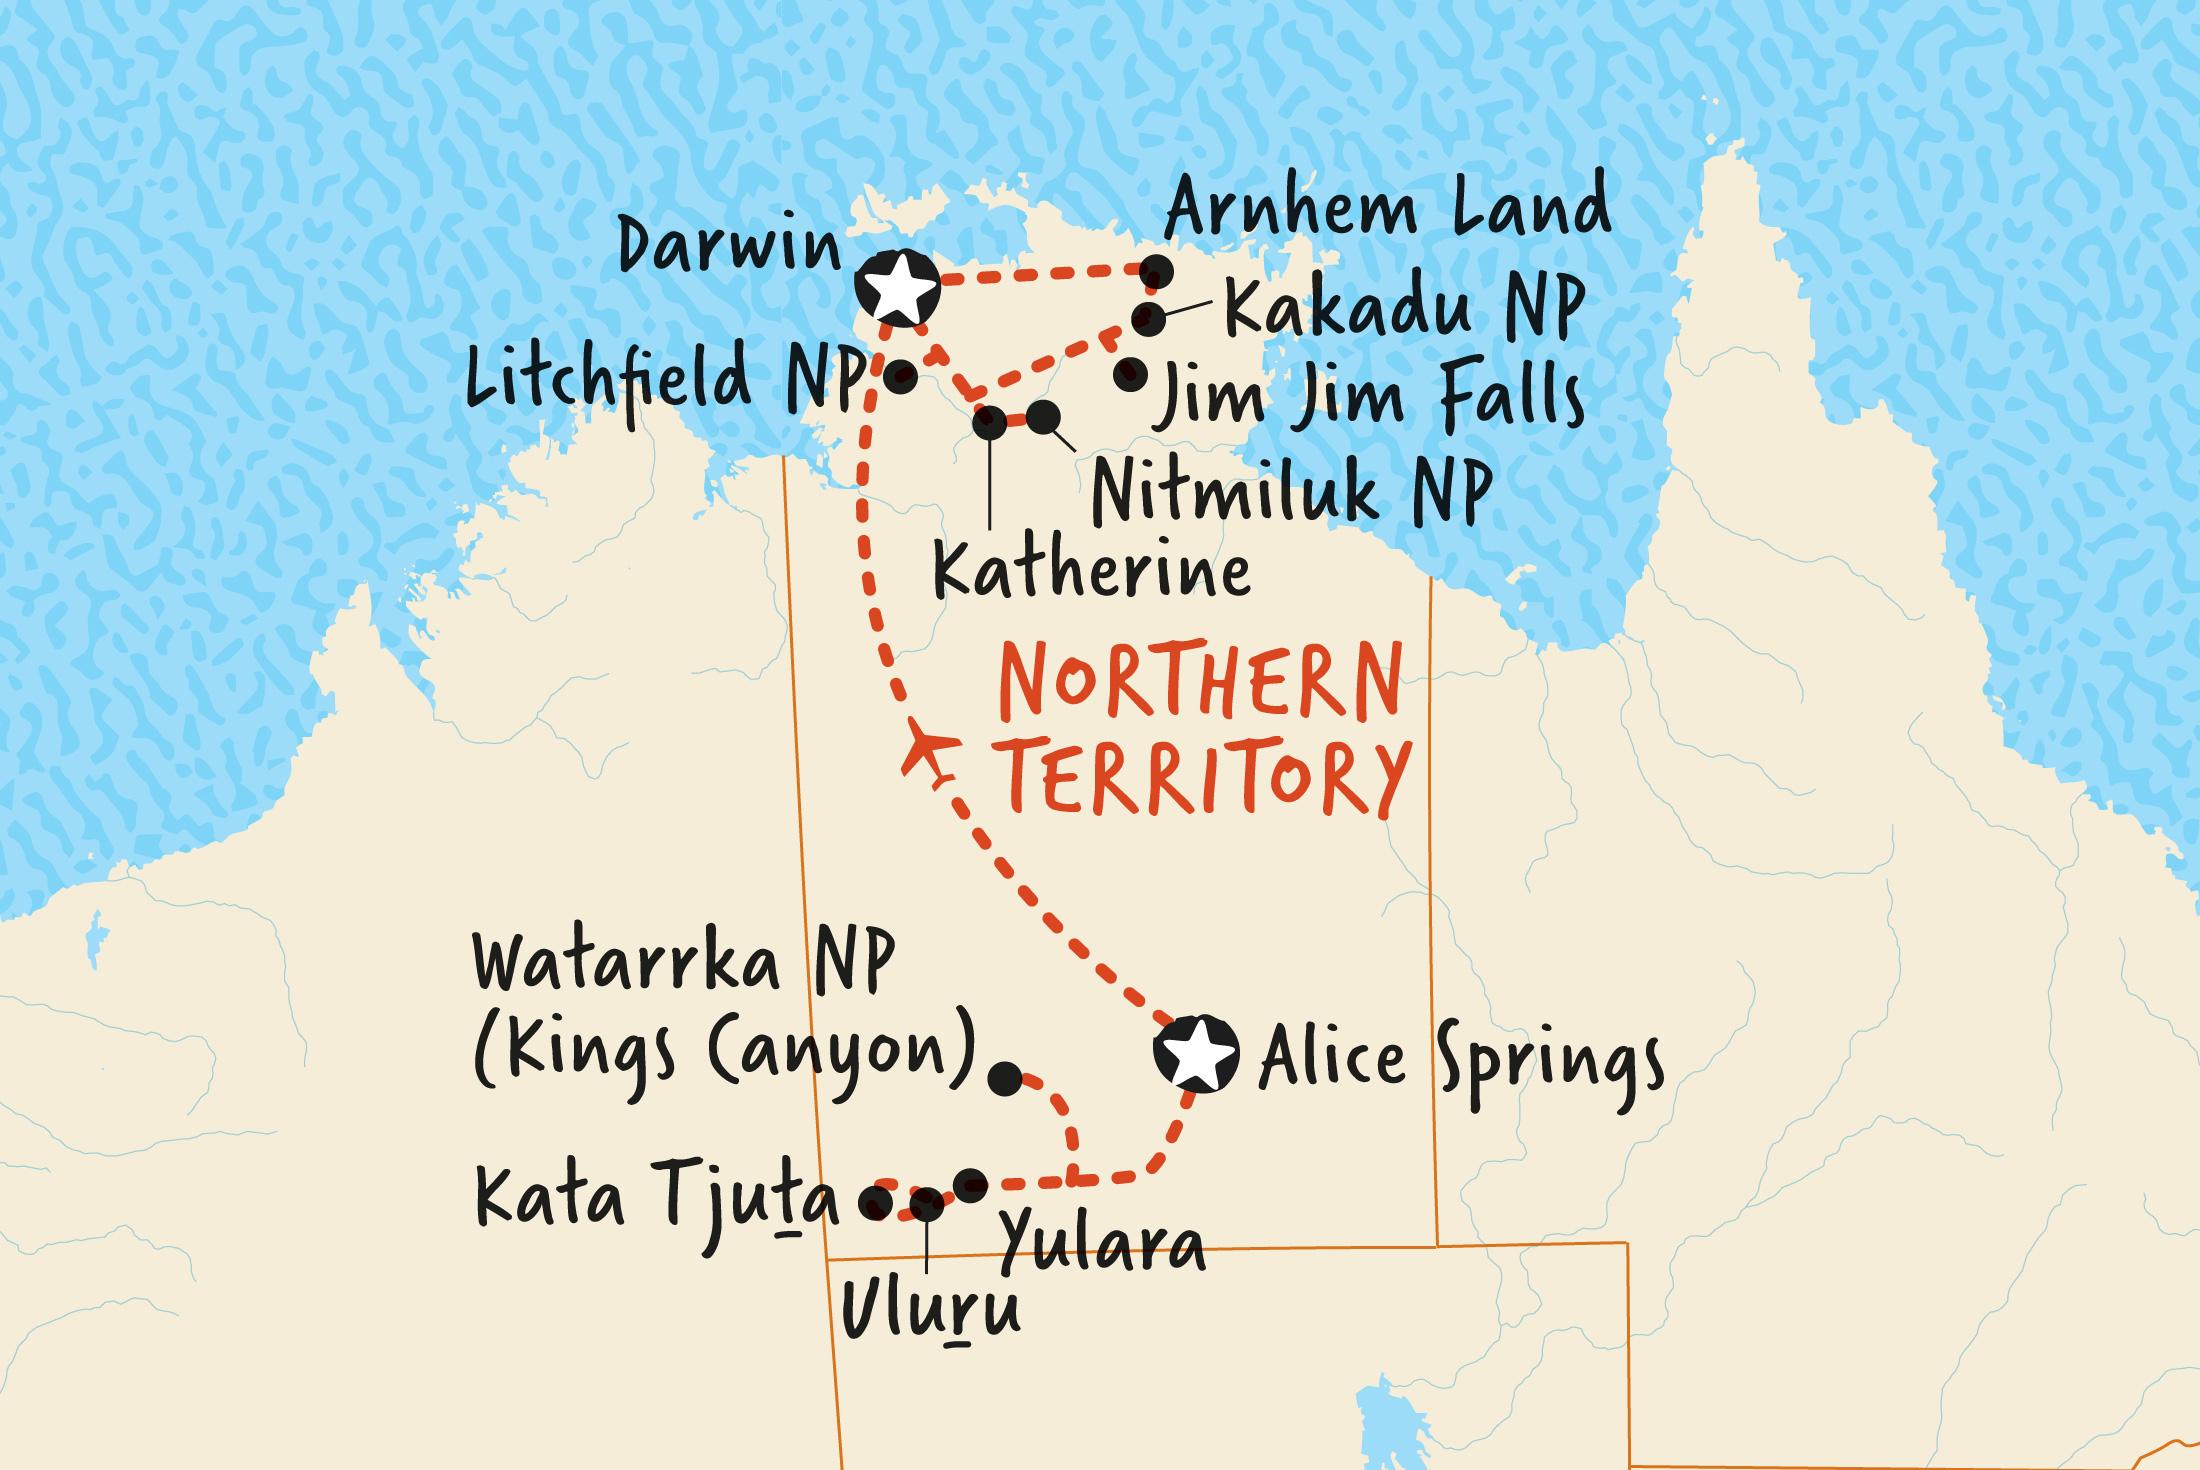 Map of Arnhem Land and Uluru Camping Adventure including Australia